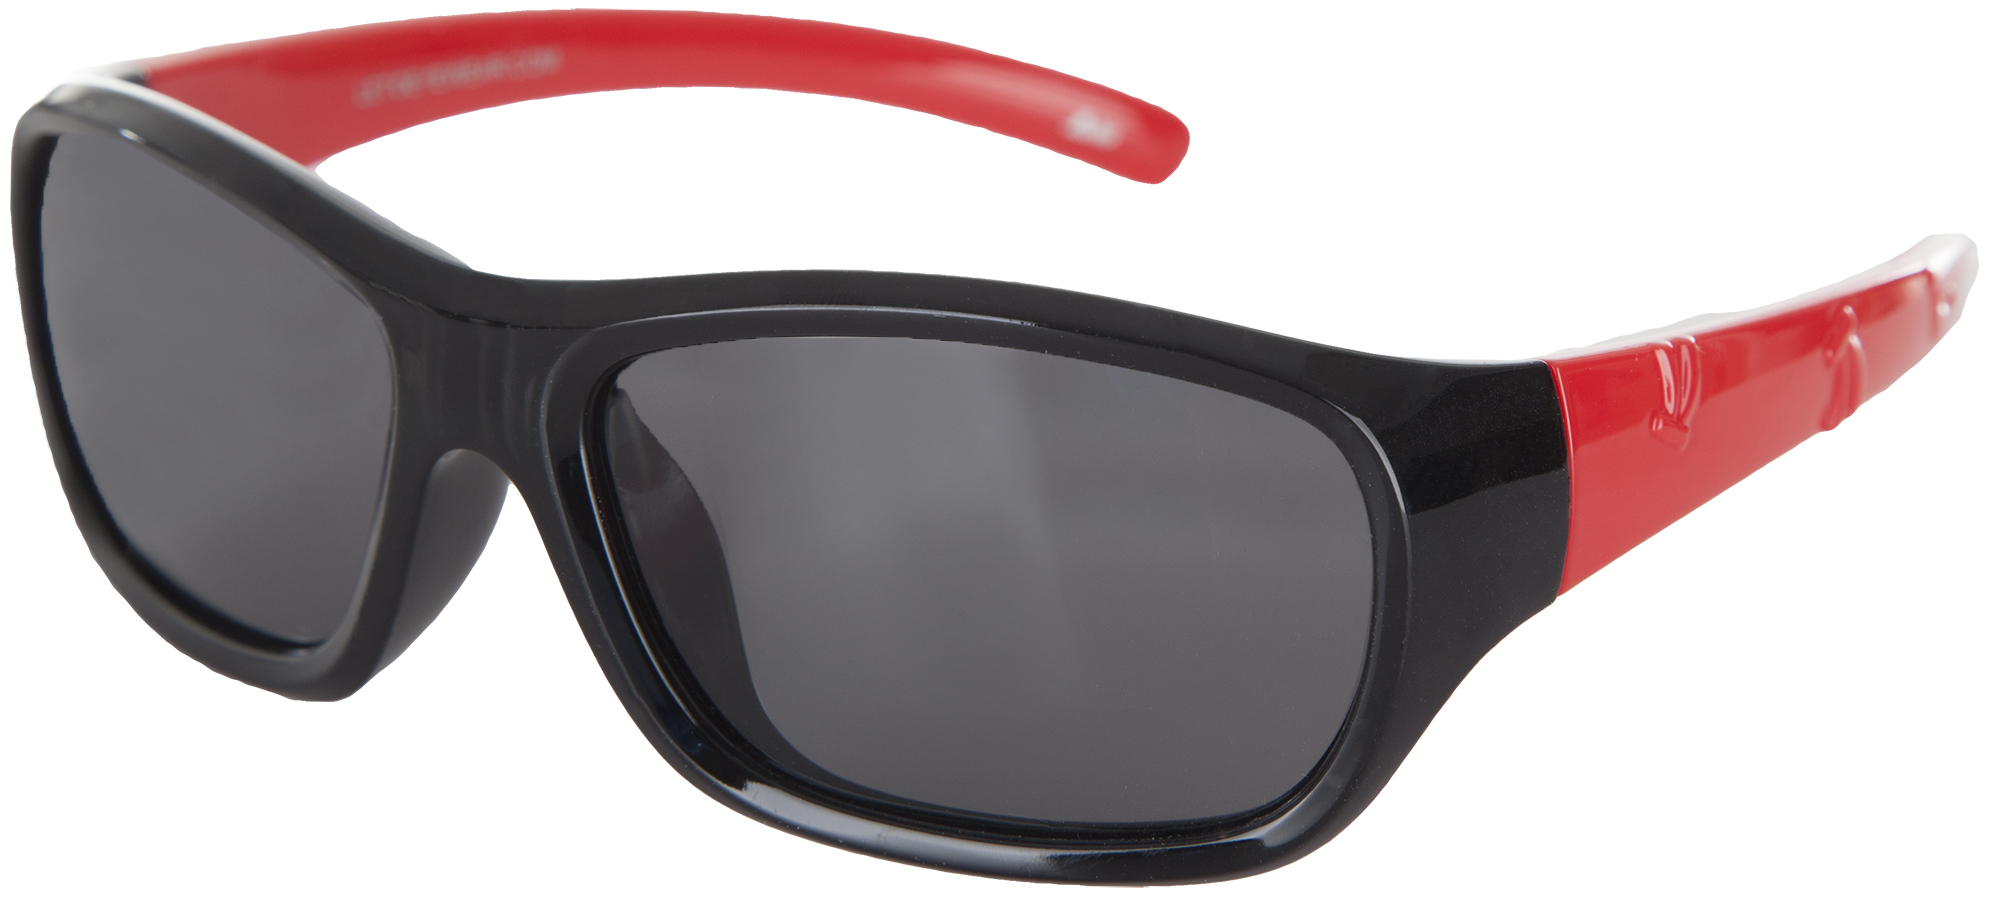 Leto Солнцезащитные очки детские Leto солнцезащитные очки vivienne westwood солнцезащитные очки vw 907s 02